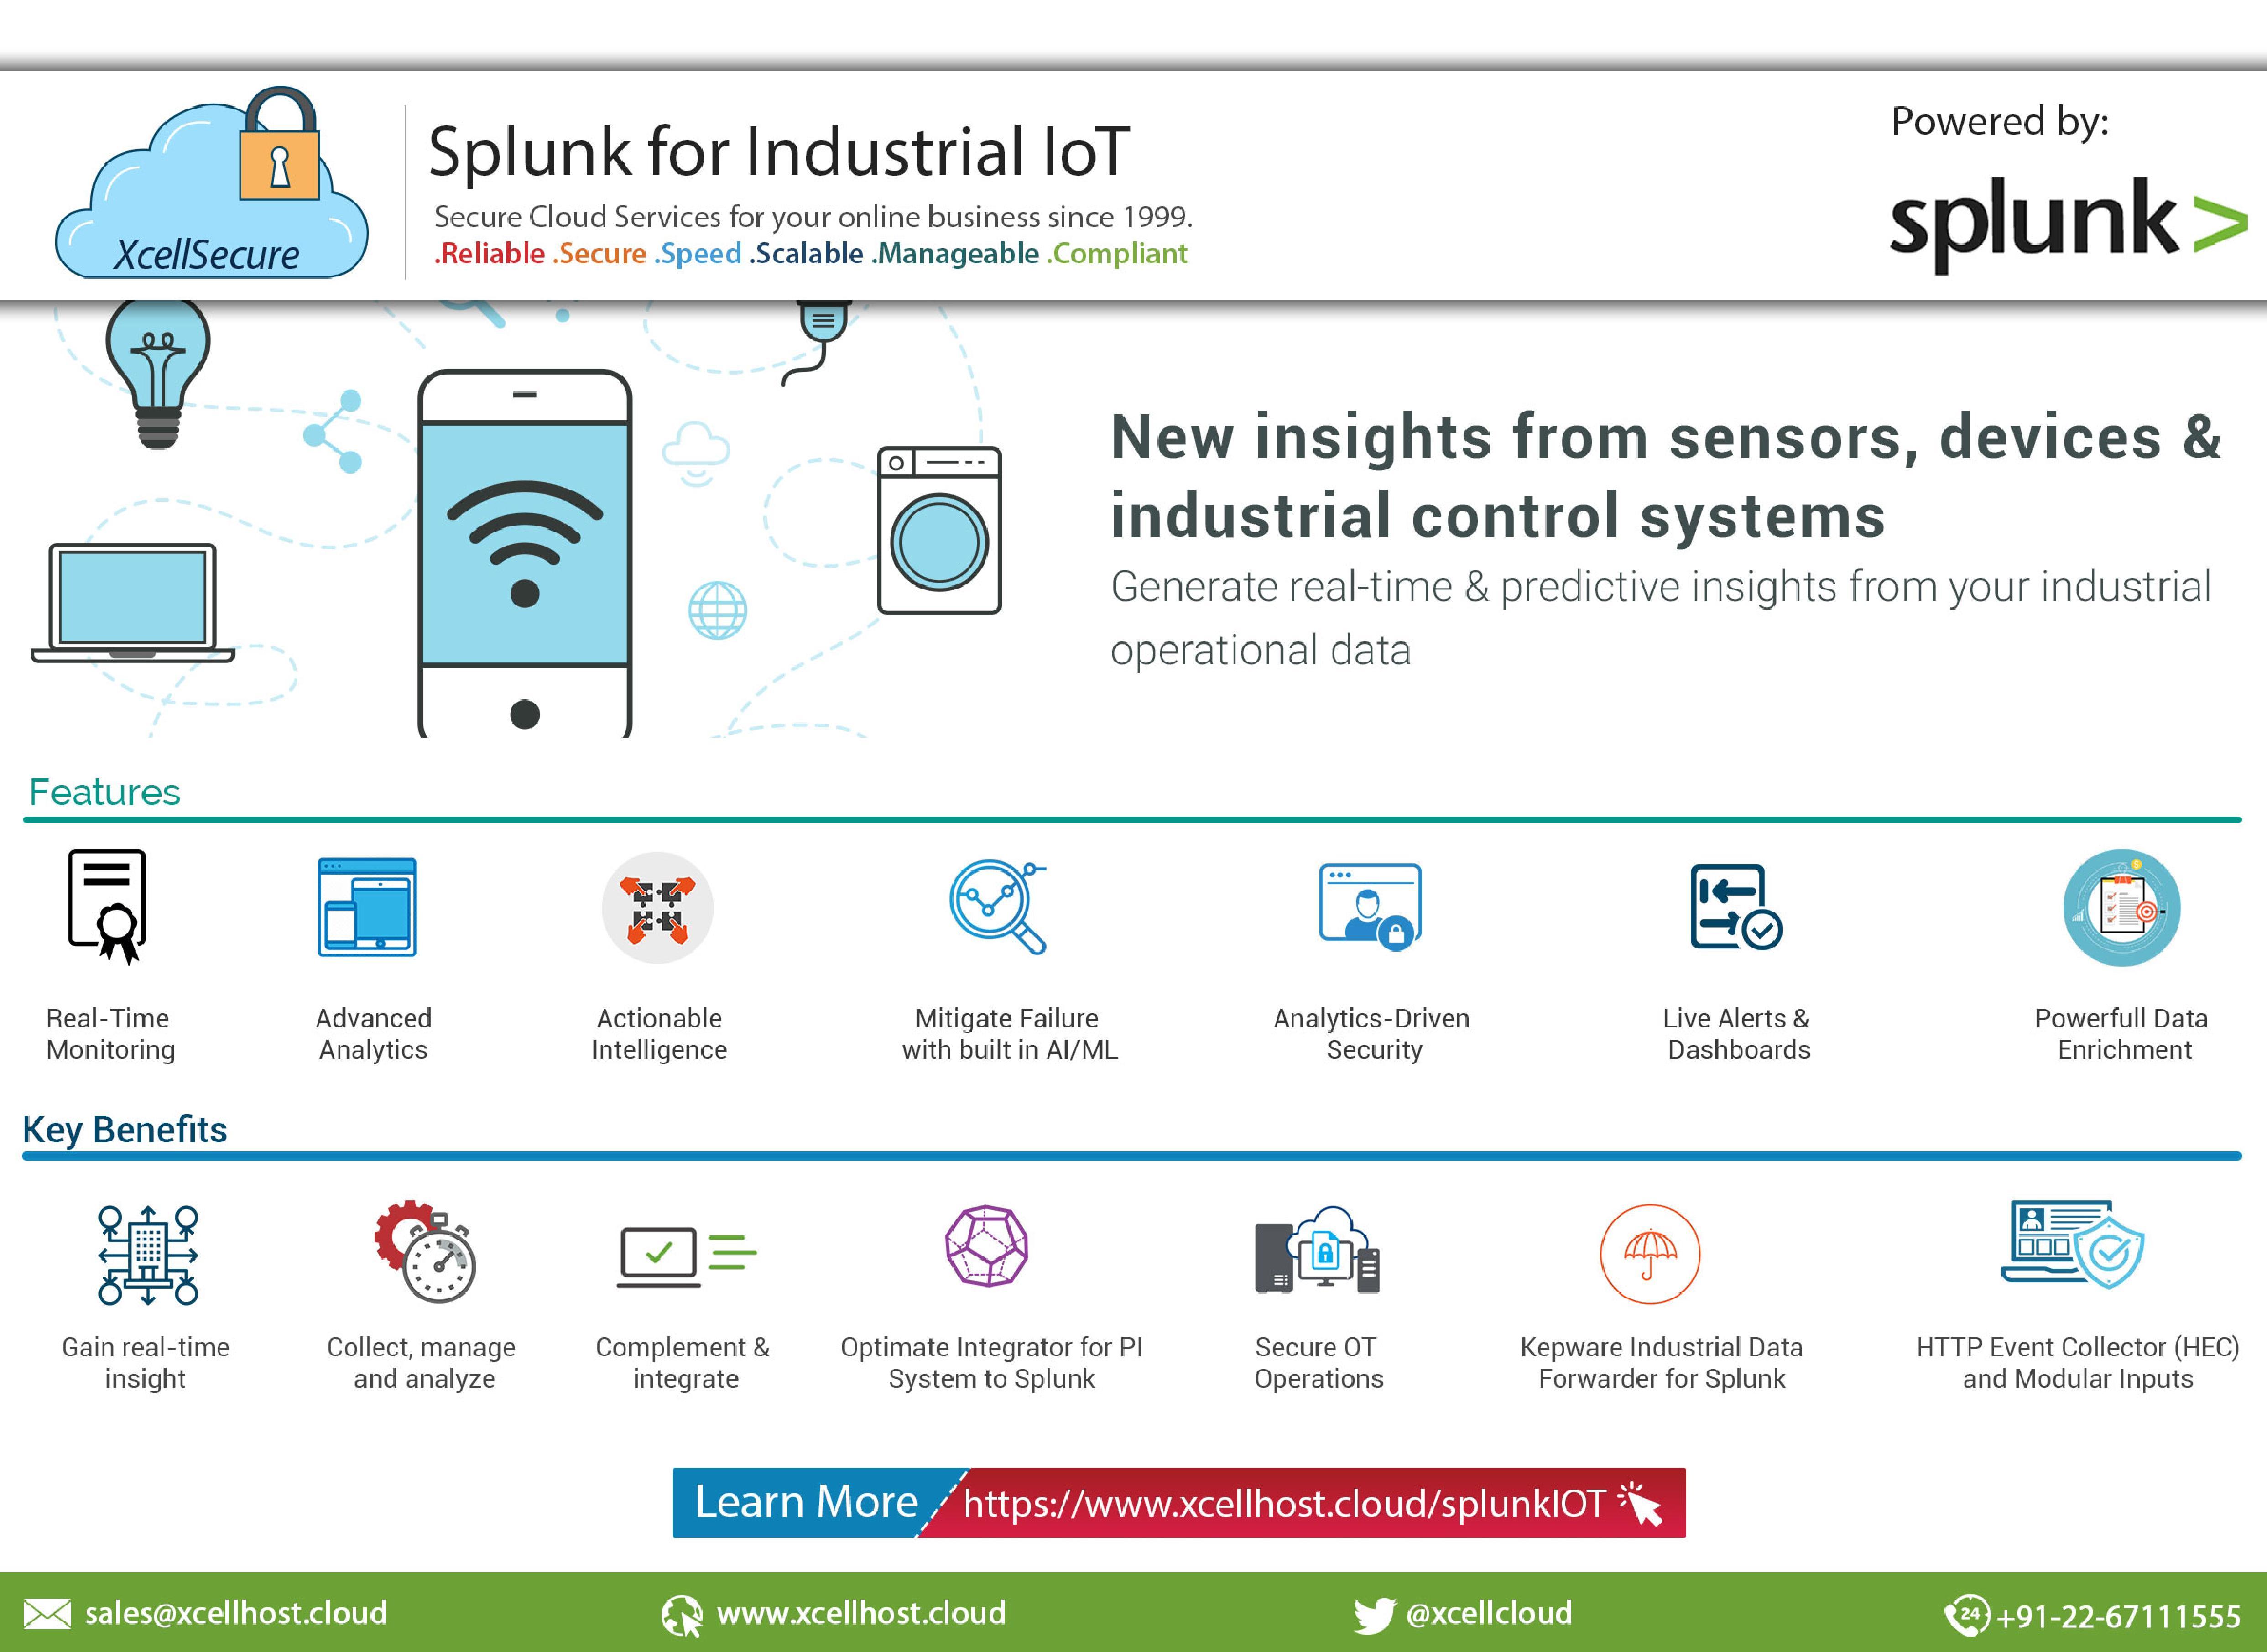 XLIN-33 Splunk-as-a-Service-page-017